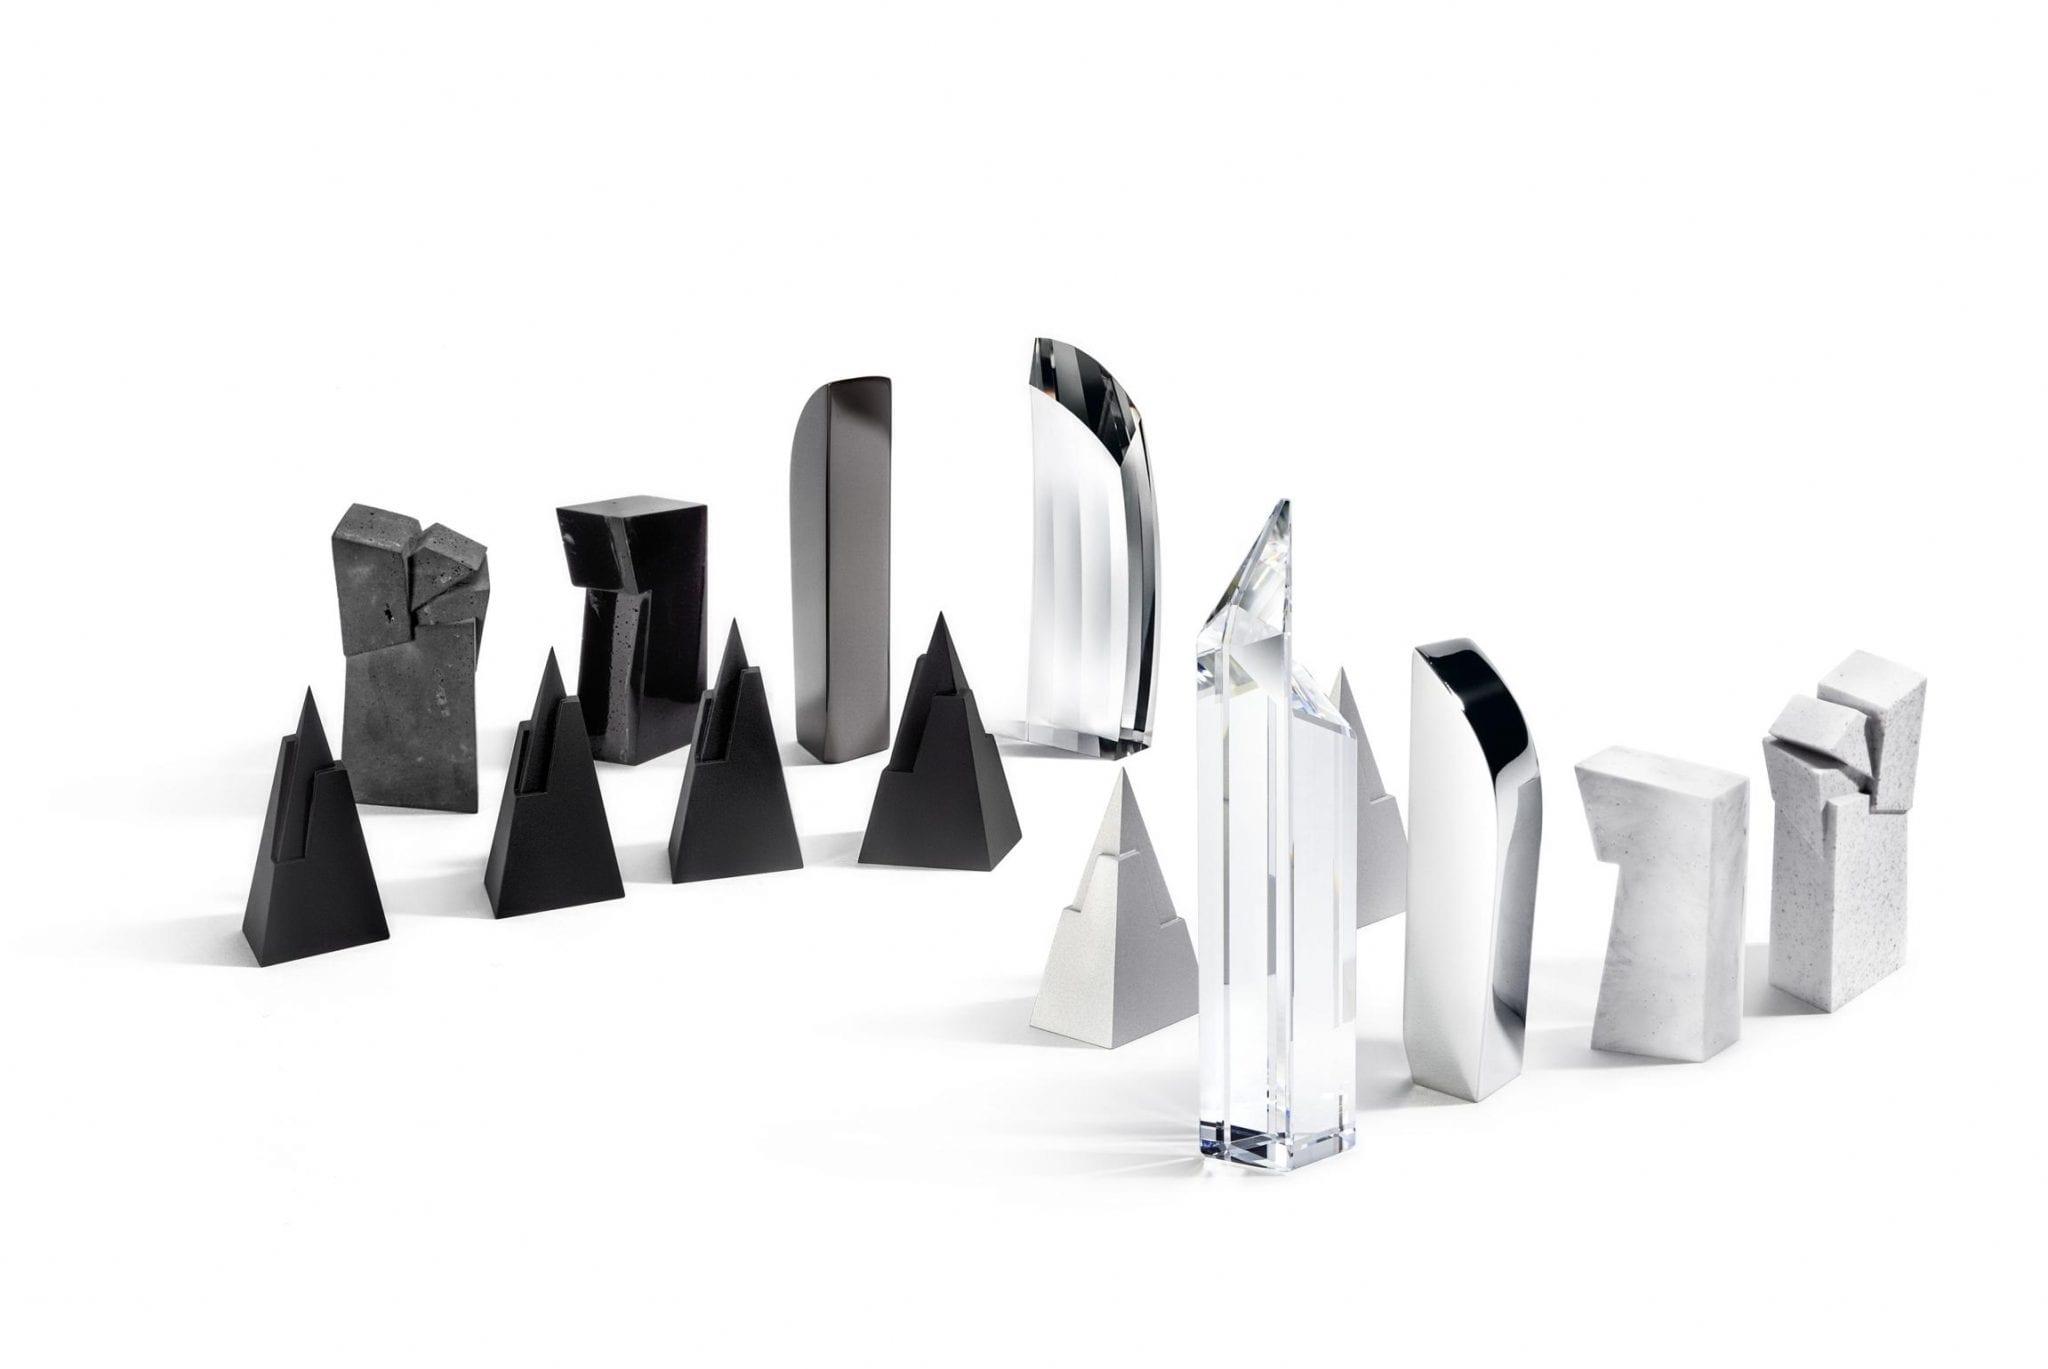 Daniel Libeskind Chess pieces (c) Studio Mierswa Kluska